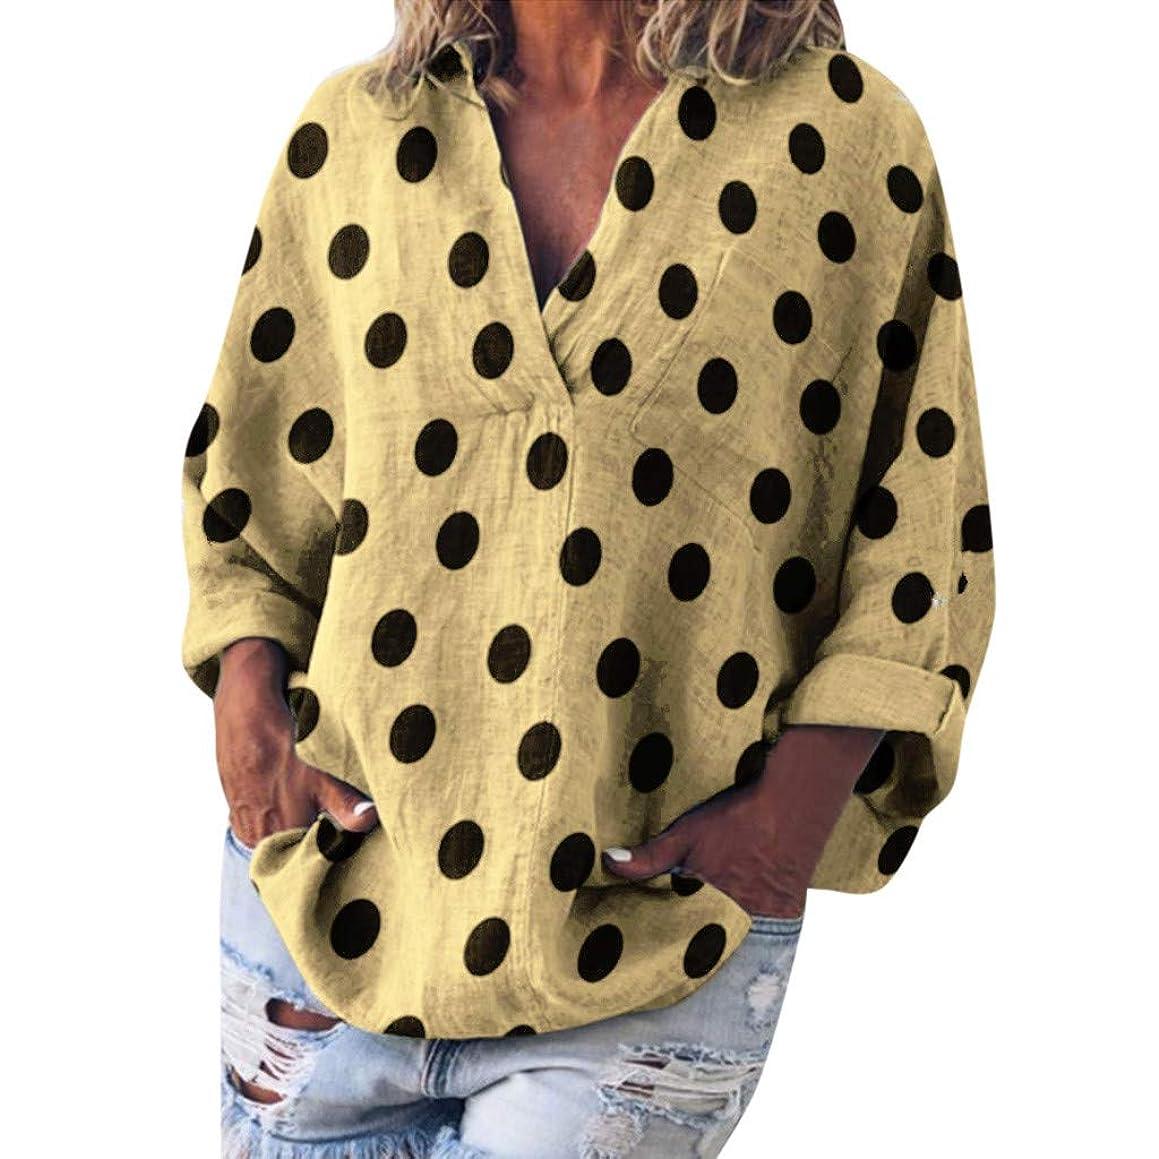 Eaktool Womens Tops,Women Casual Dot Print Long Sleeve V-Neck Loose Shirt Pocket Blouse Tops